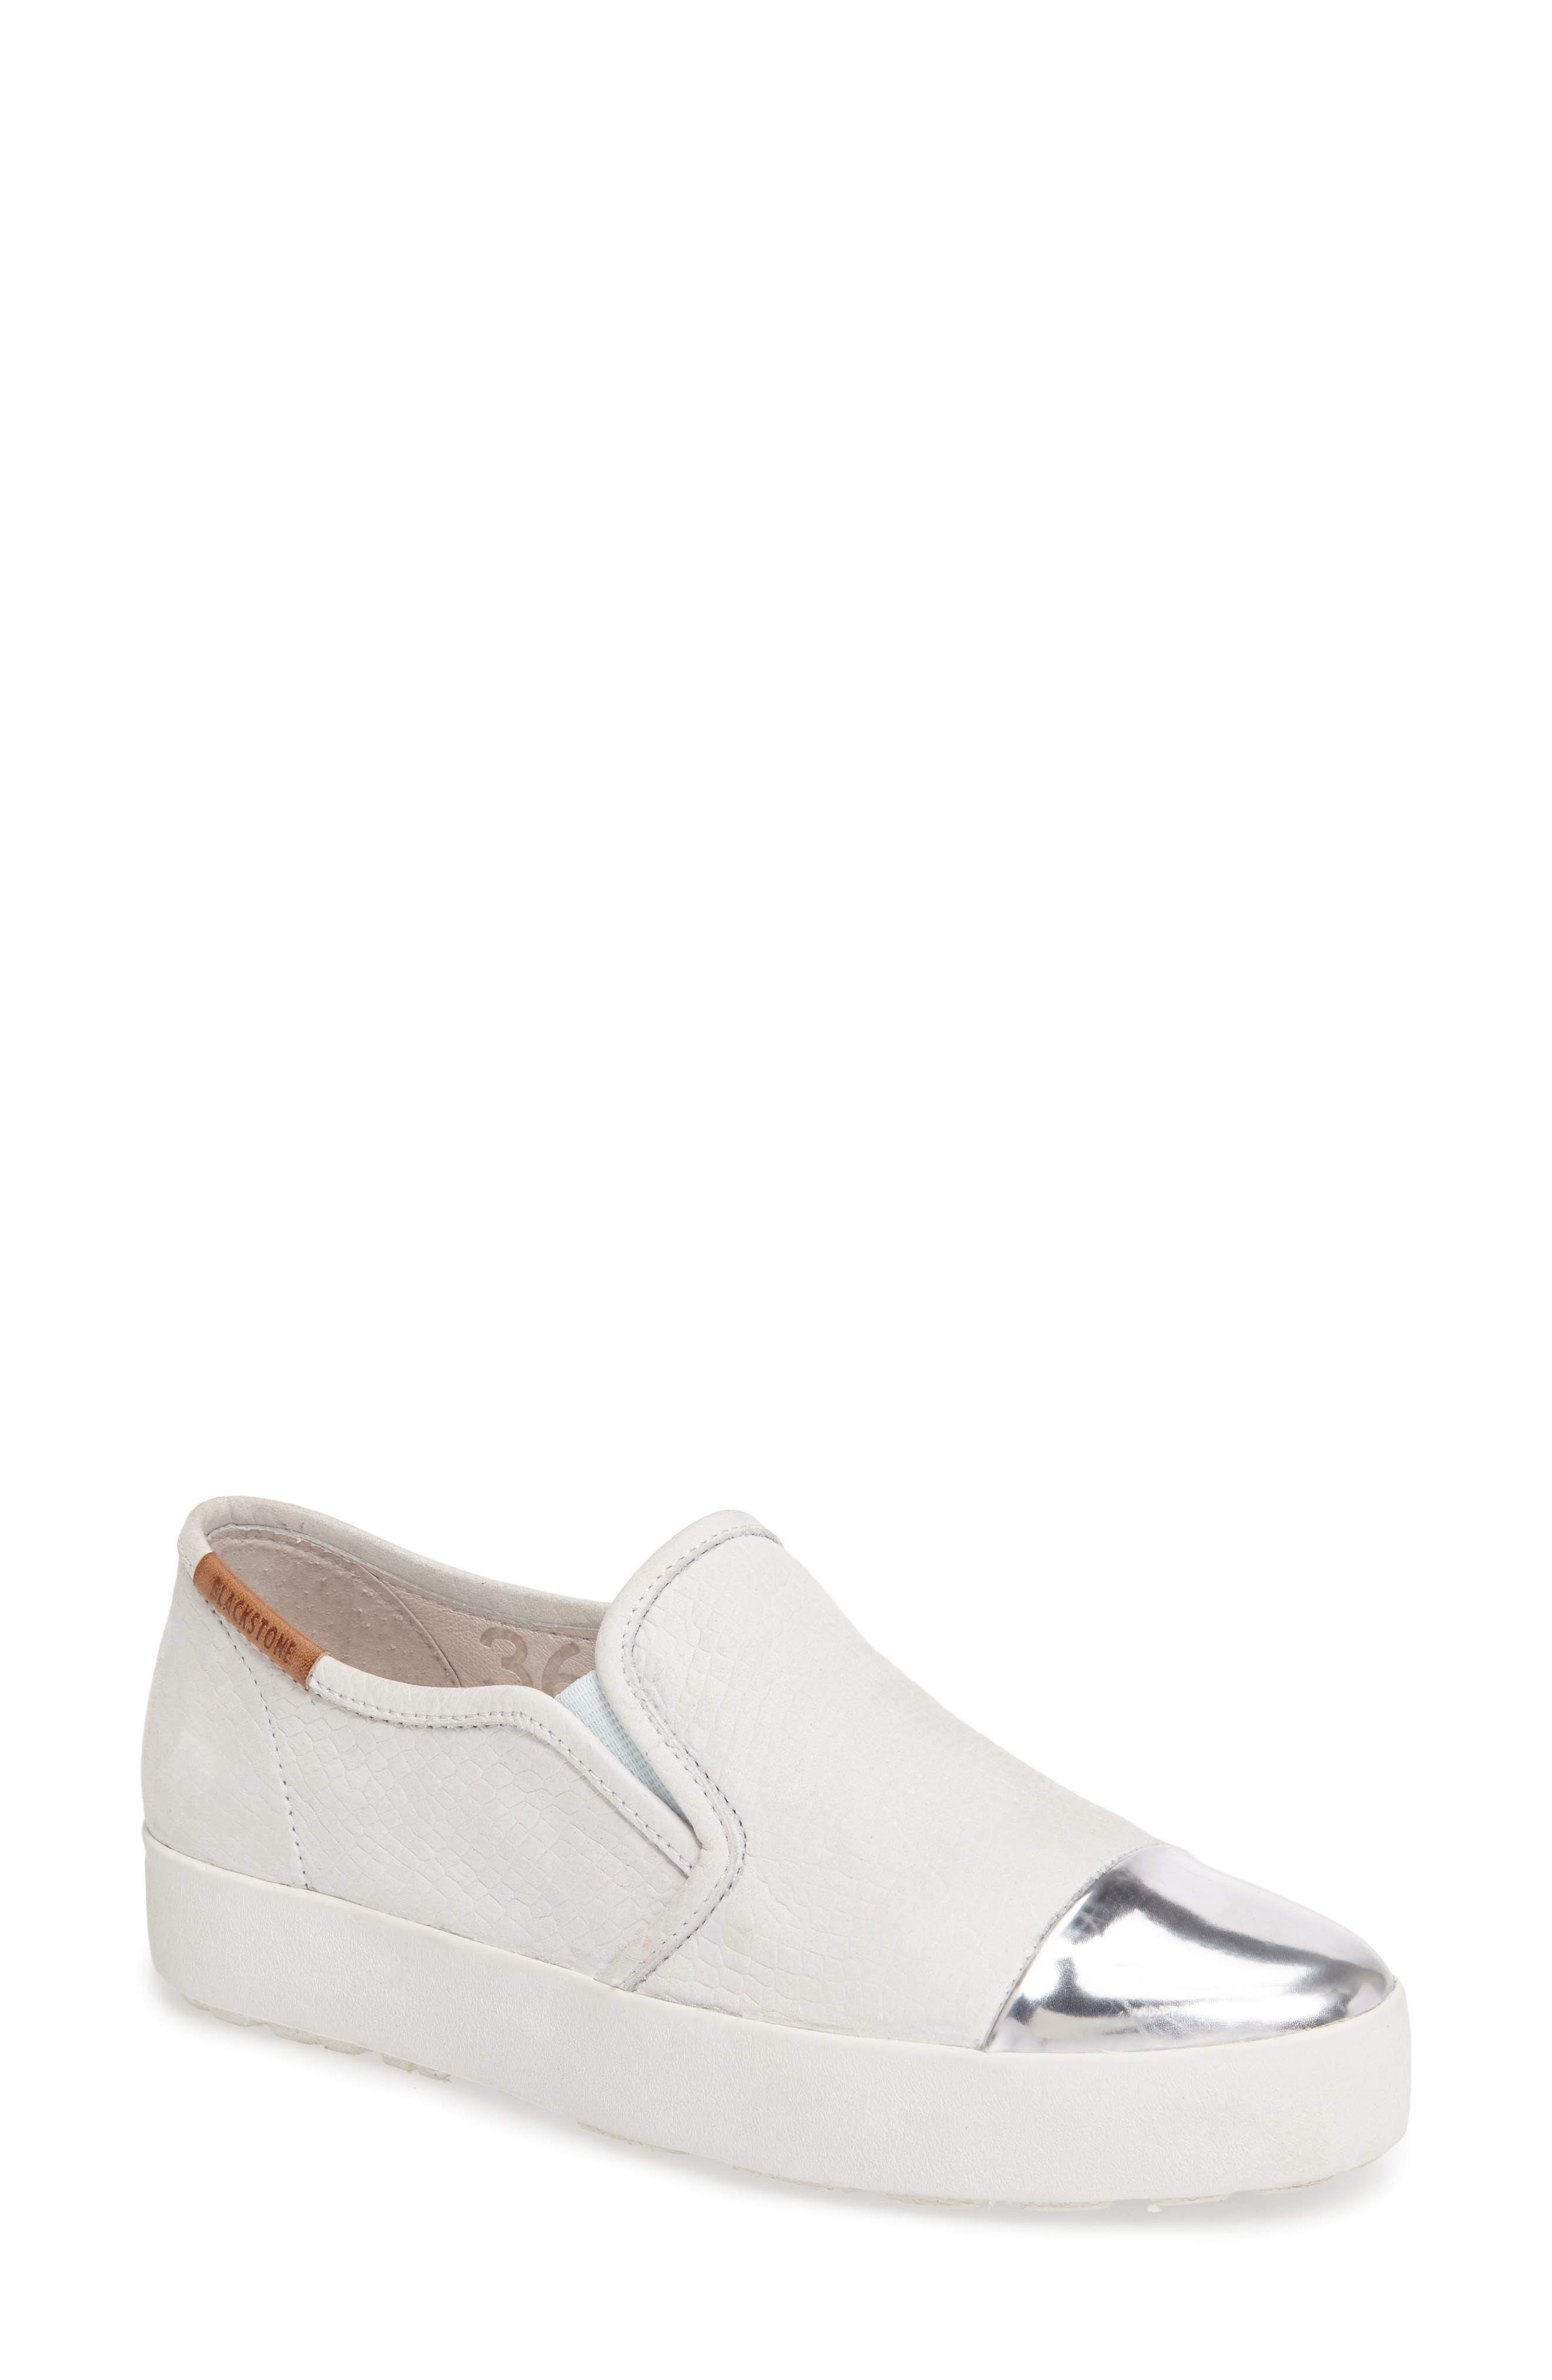 Main Image - Blackstone NL47 Slip-On Sneaker (Women)